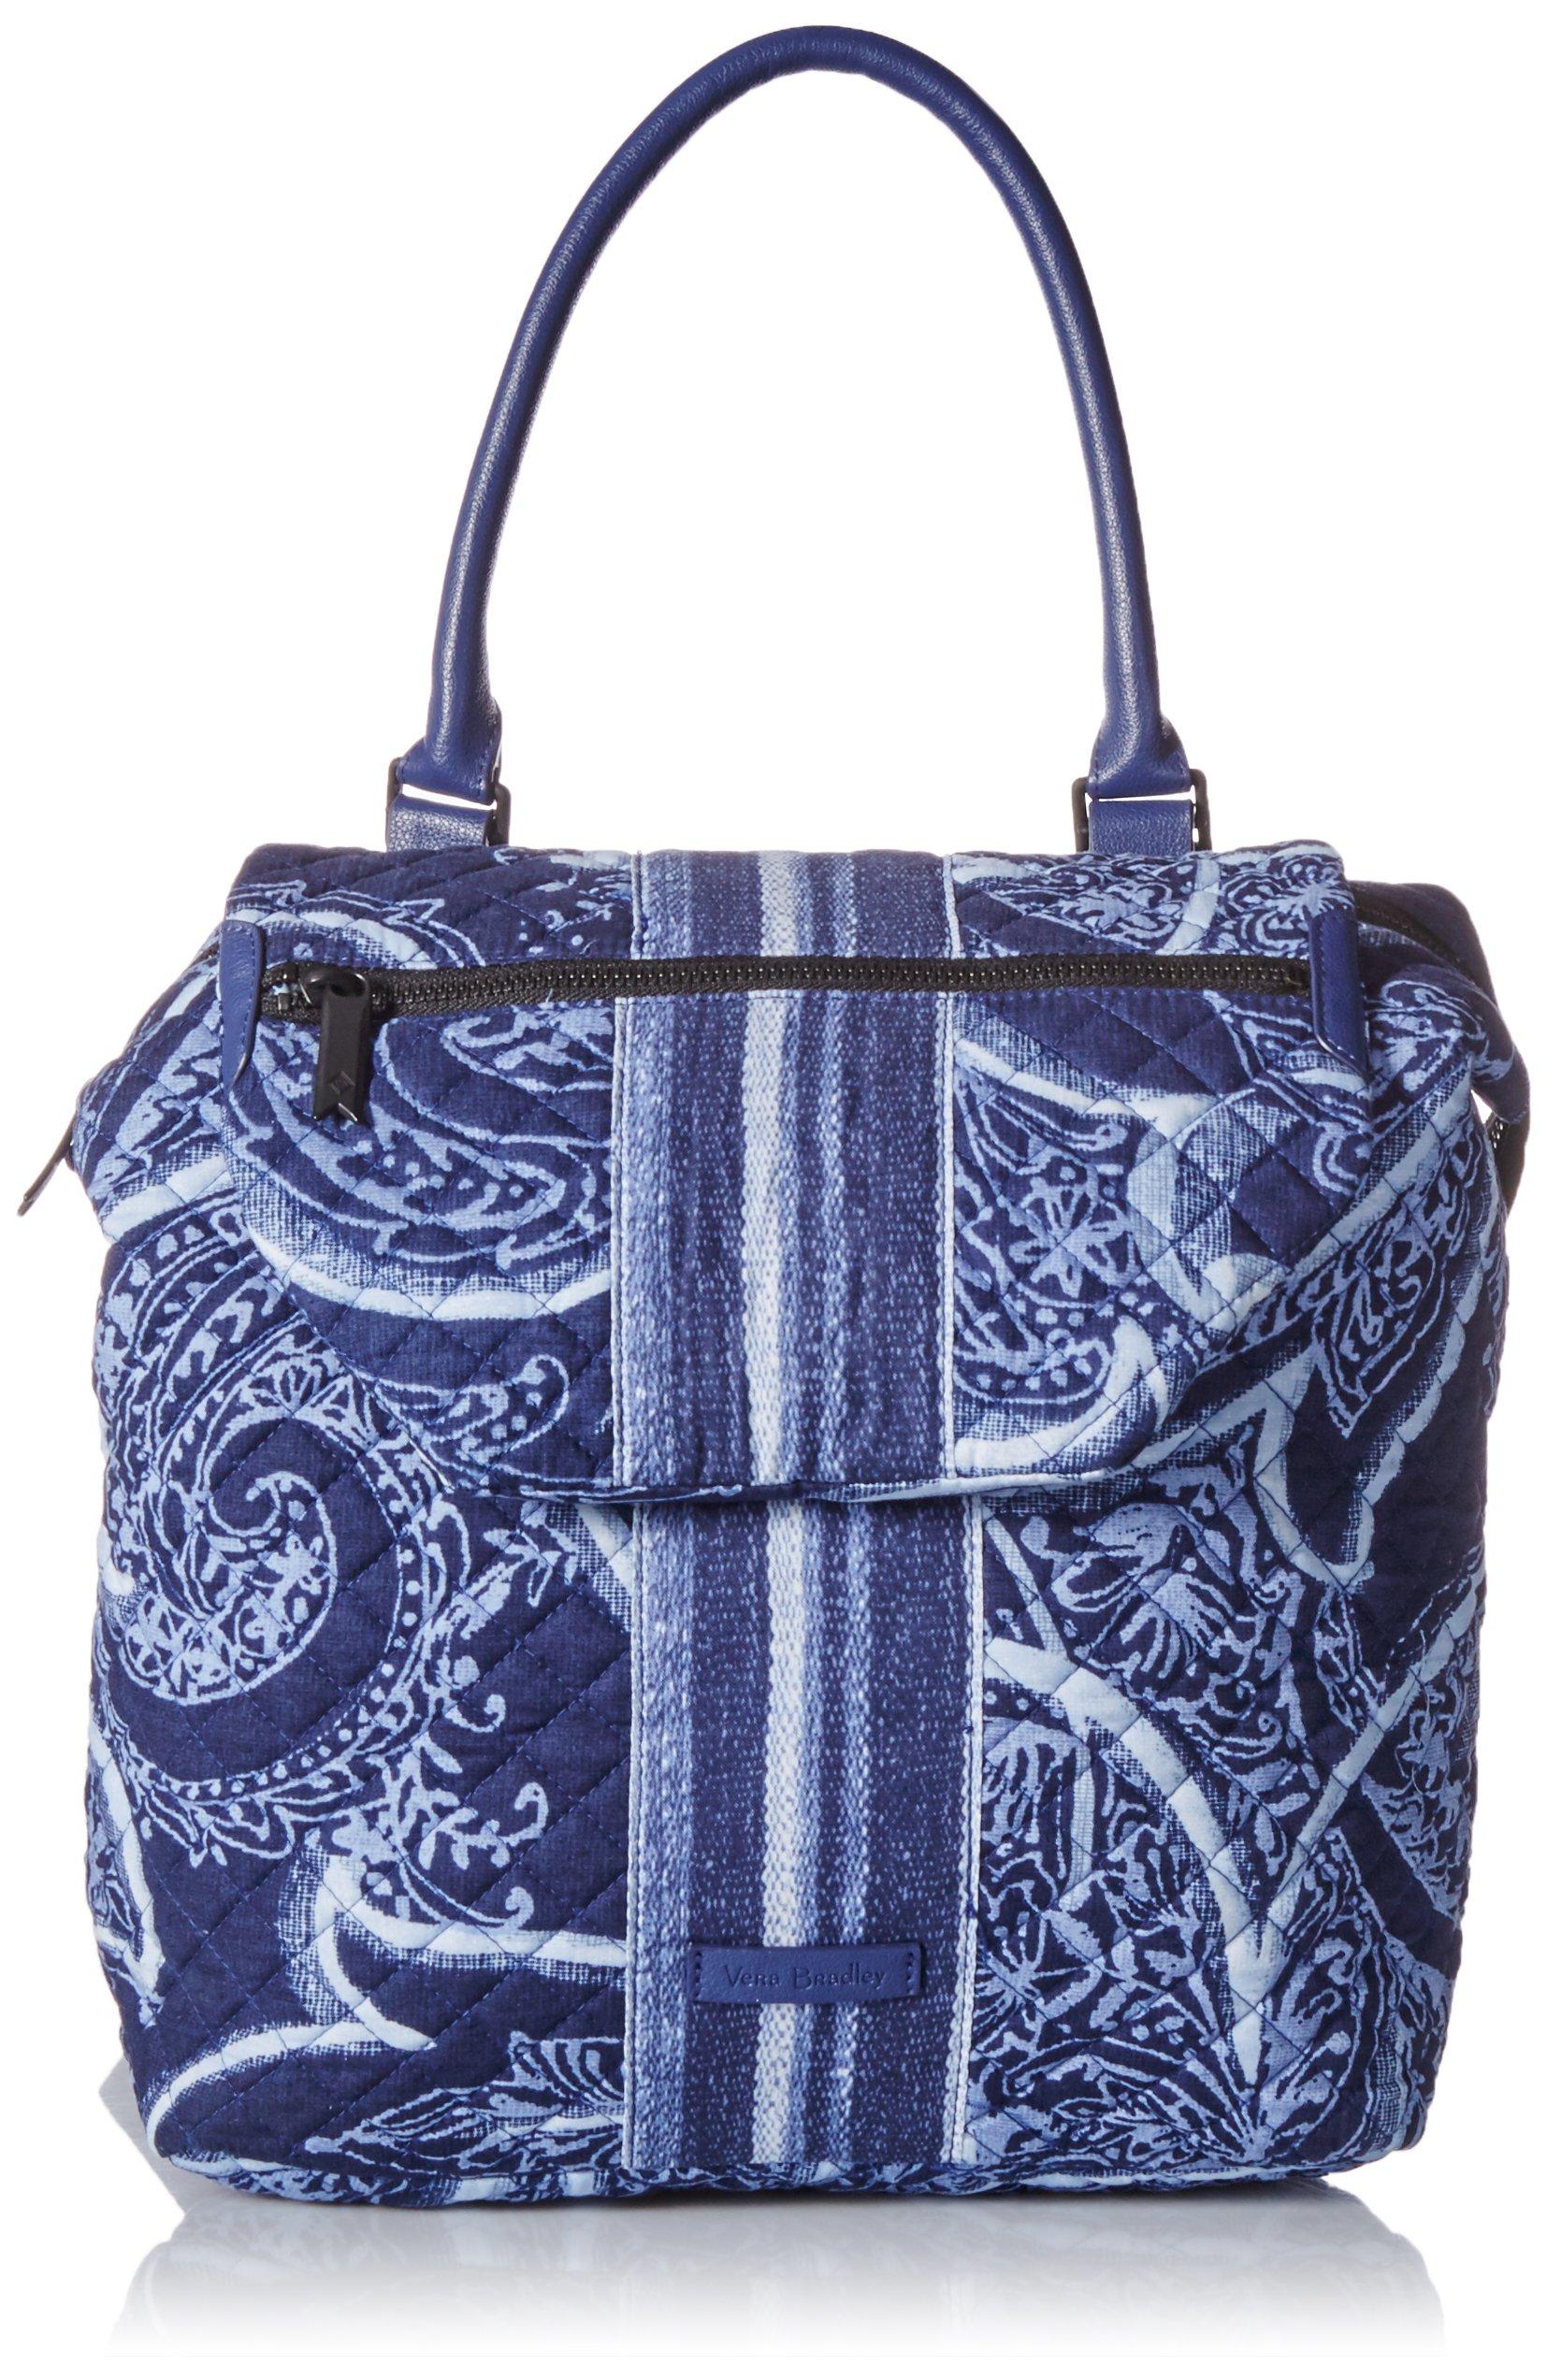 Vera Bradley Change It Up Backpack, Signature Cotton, Indio